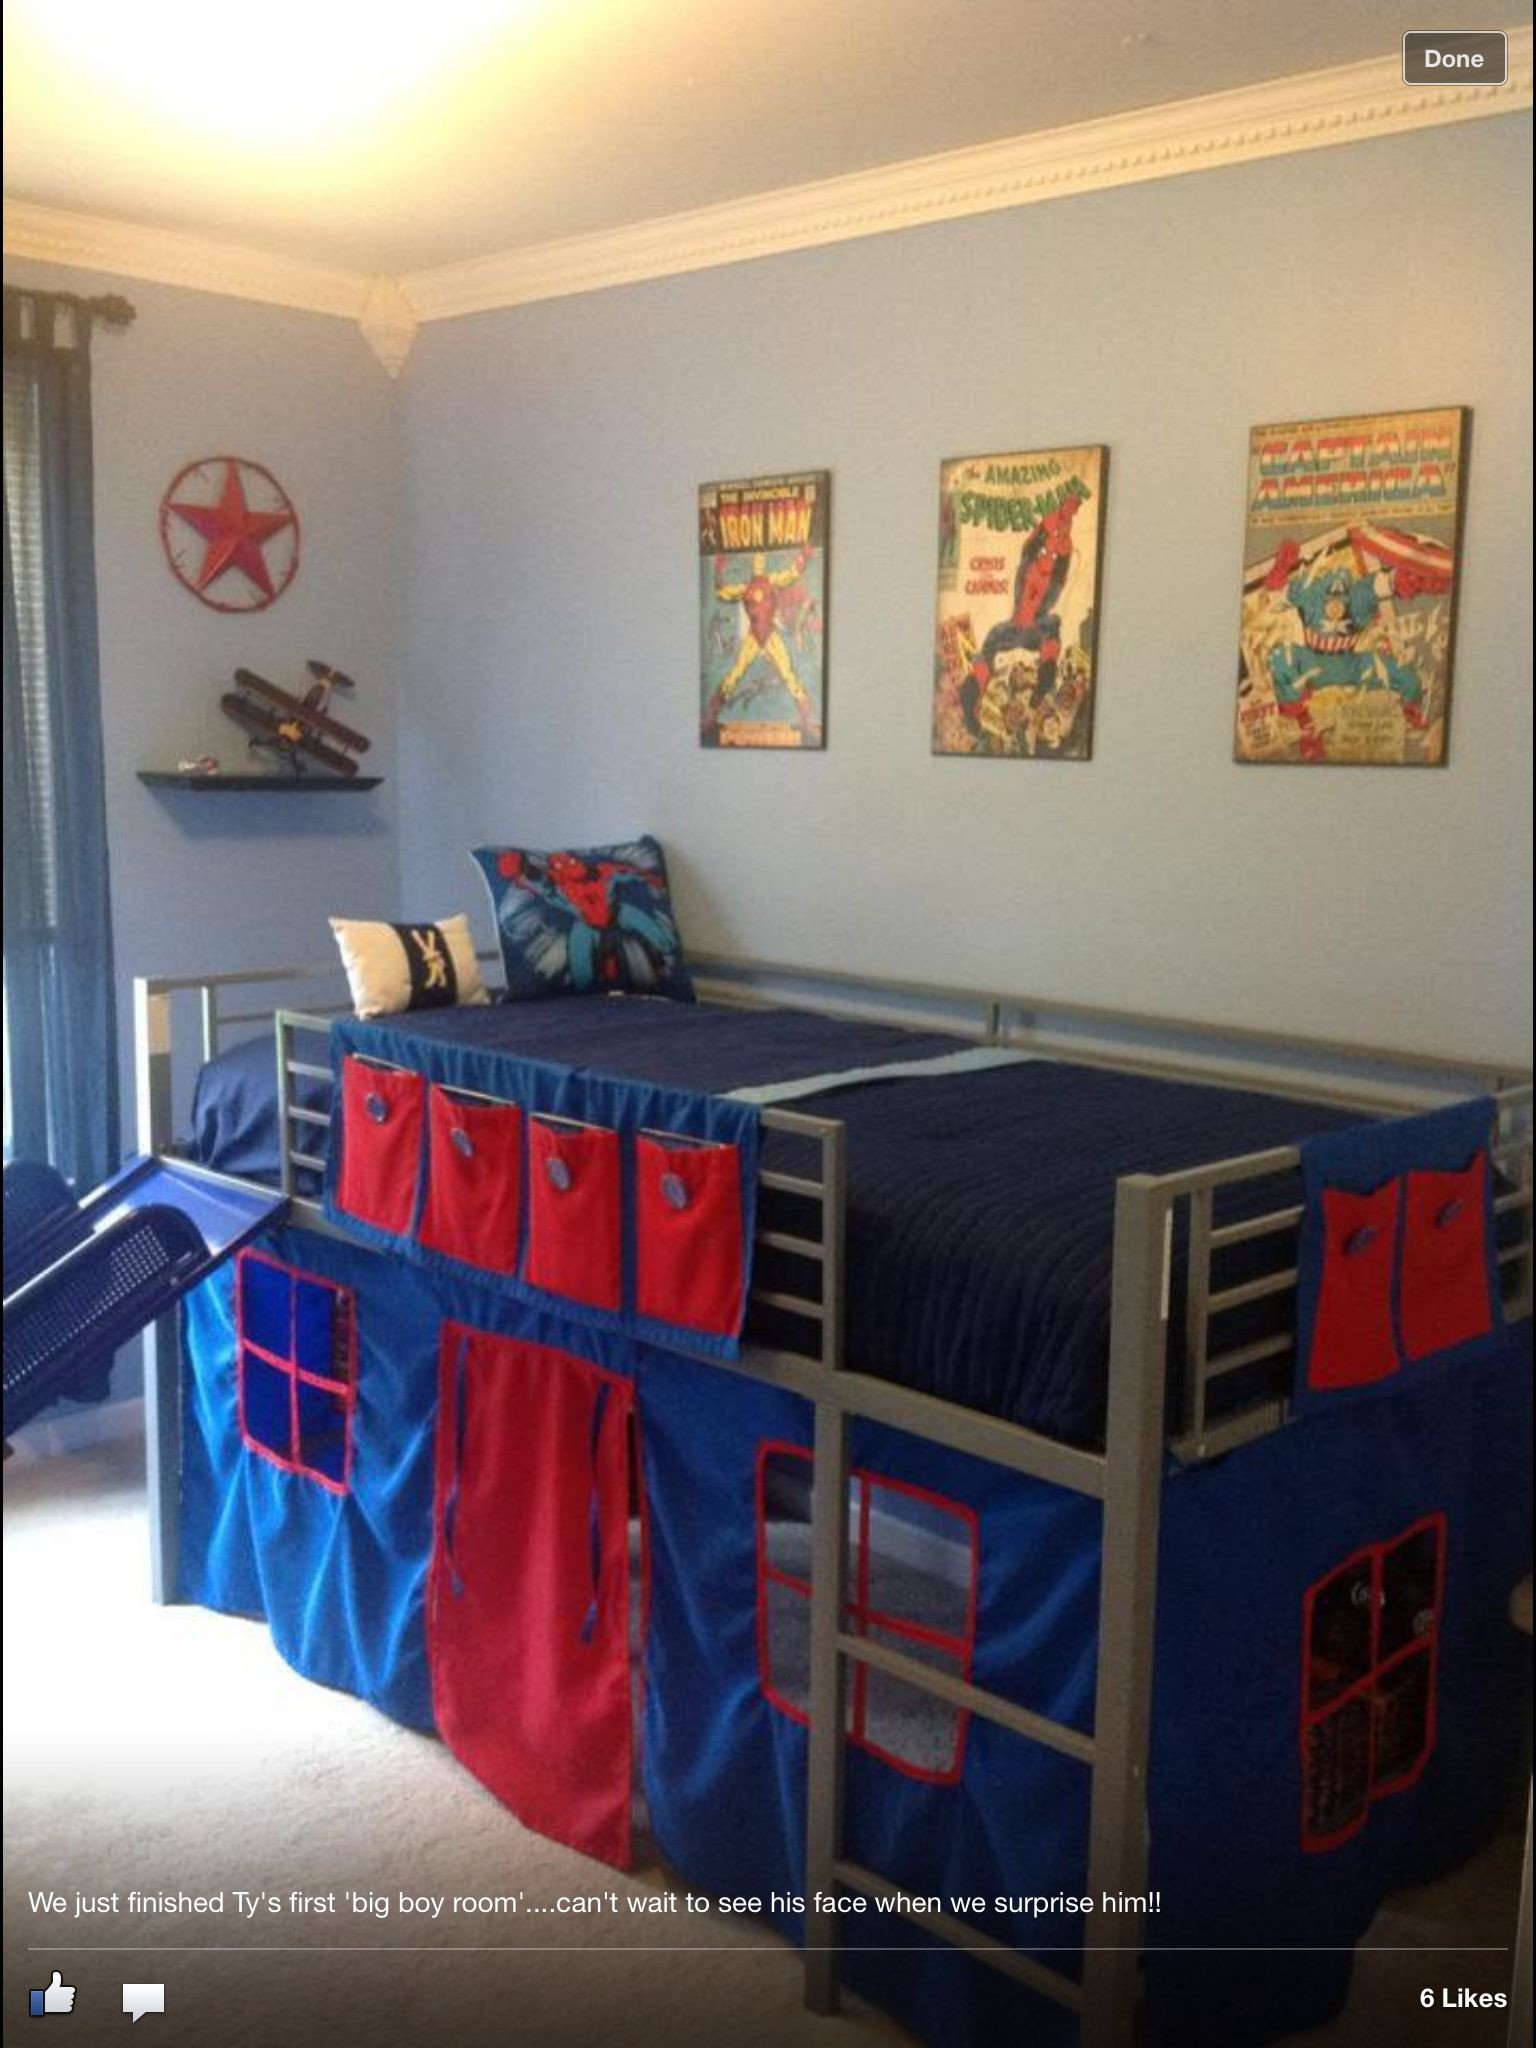 Loft Bed Bedroom Ideas Awesome Boys Super Hero Loft Bedroom Junior Fantasy Loft Bed with